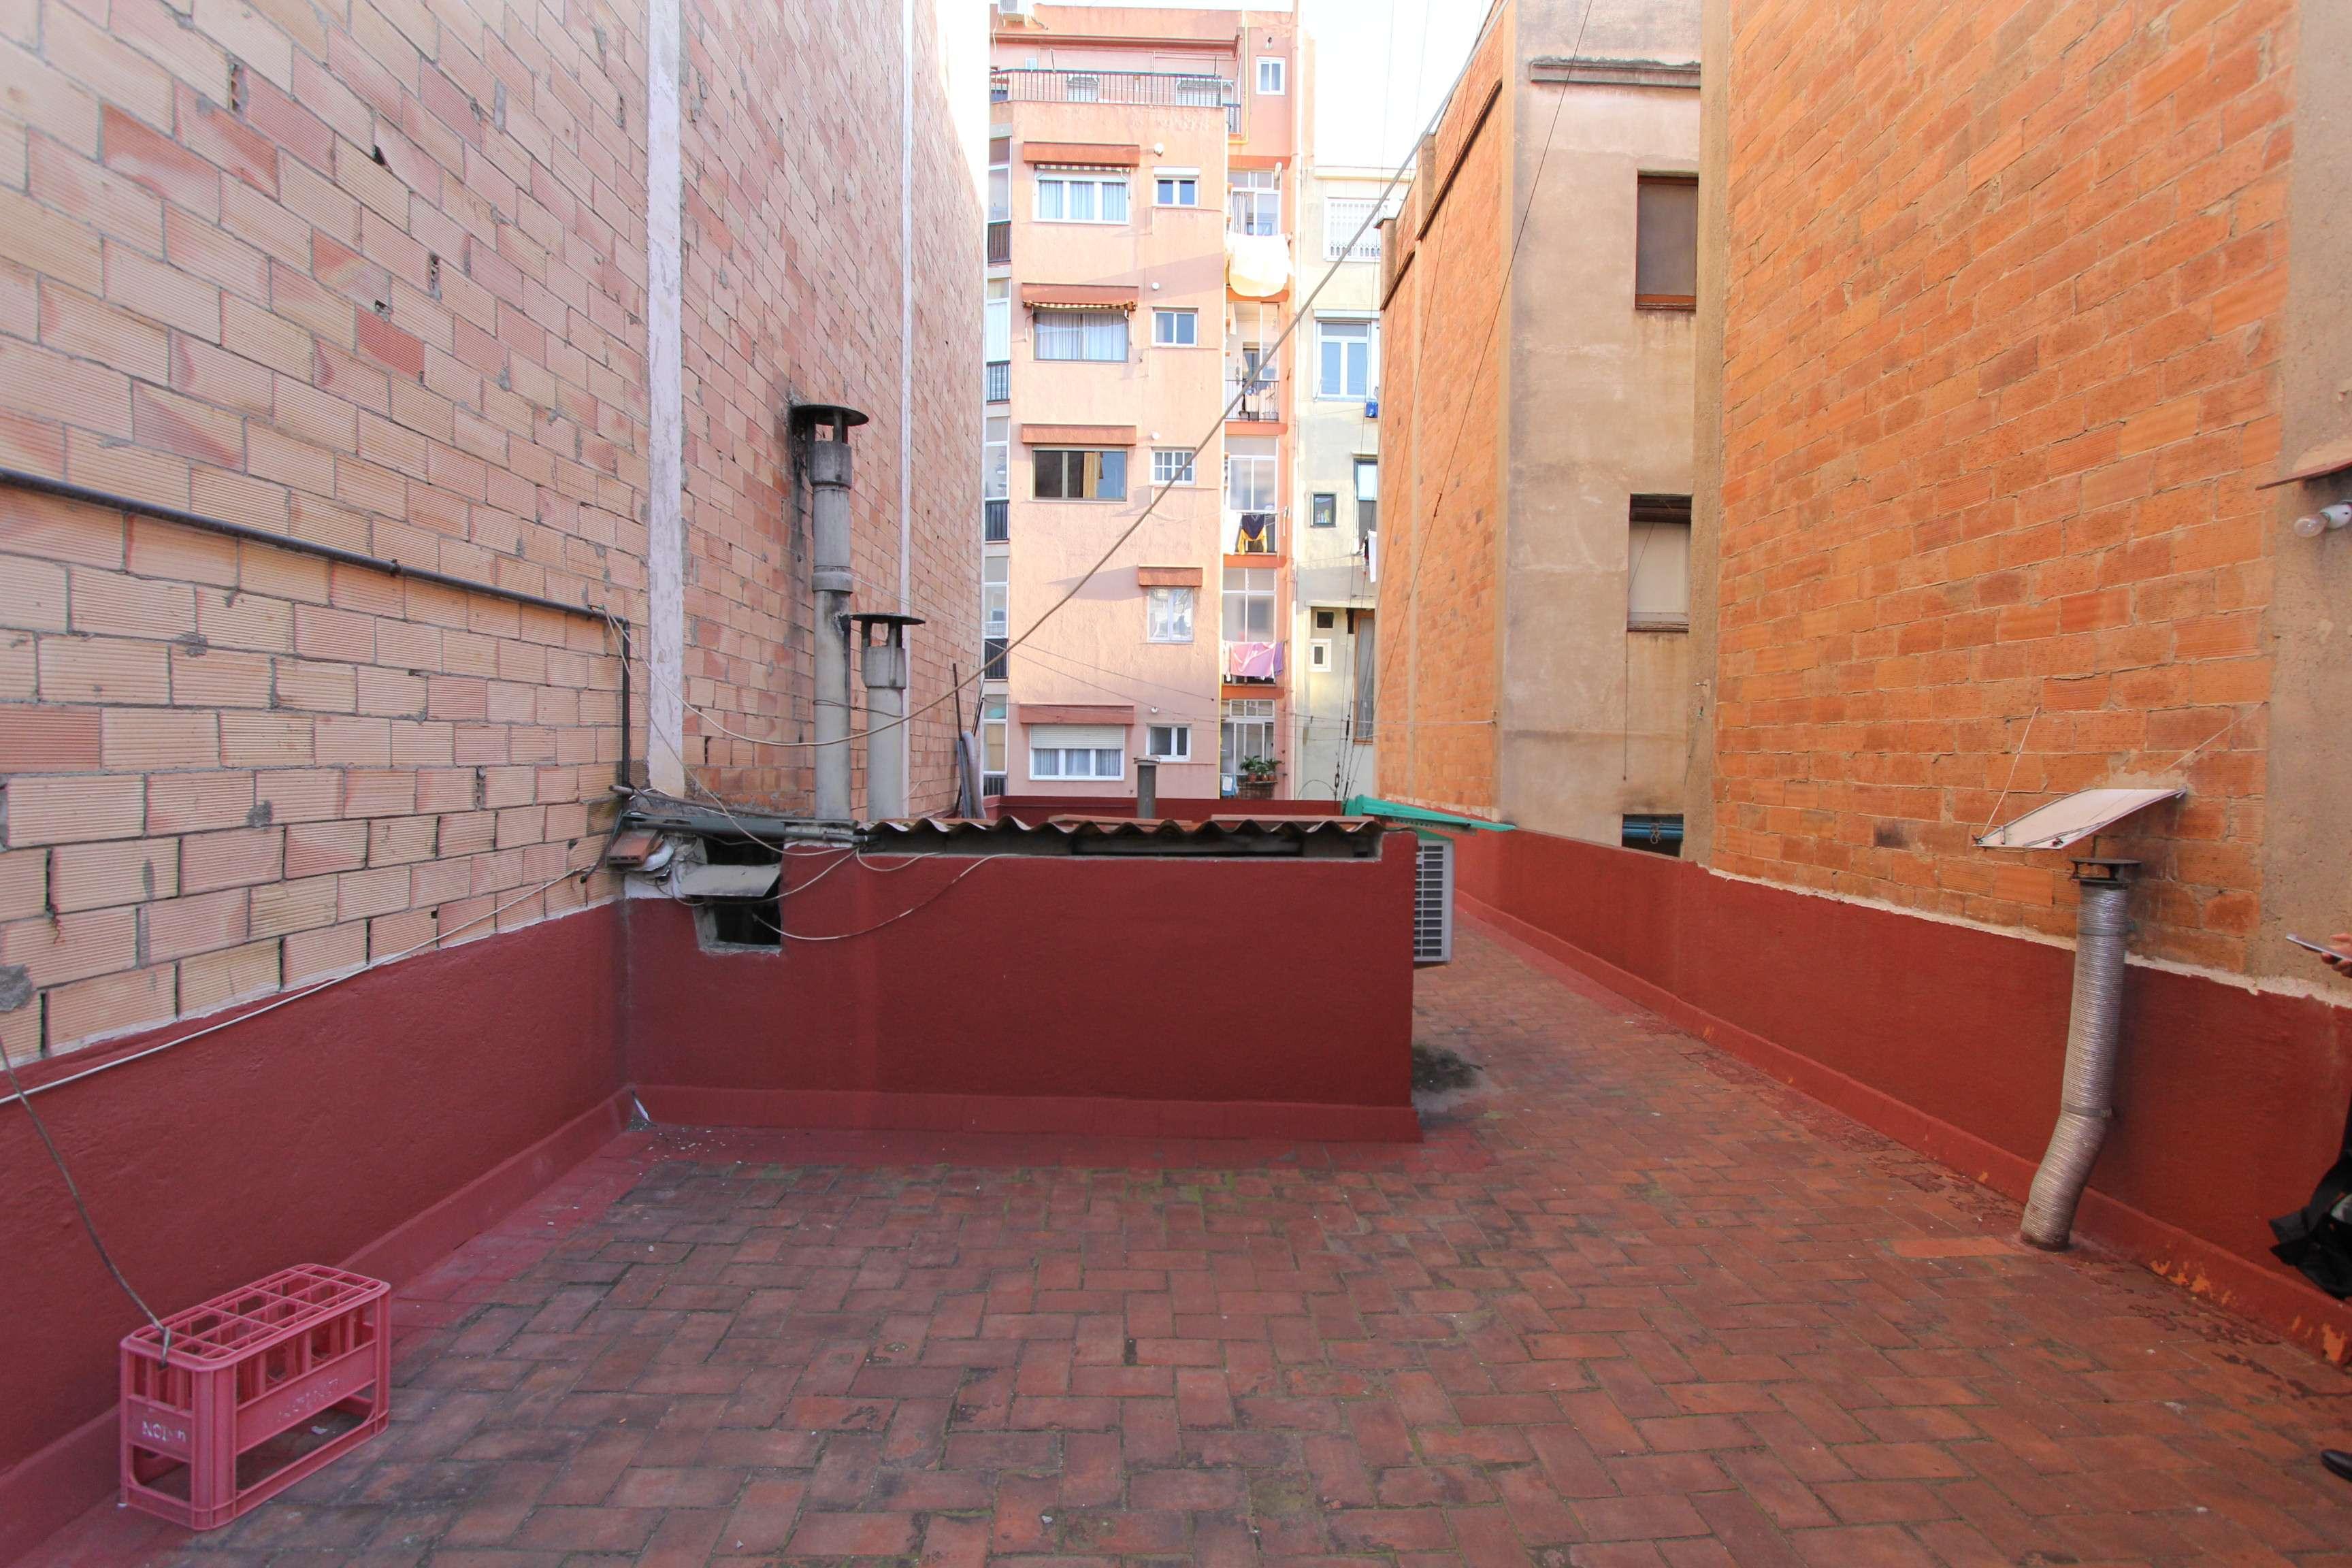 Здание на продажу в районе Клот, Барселона